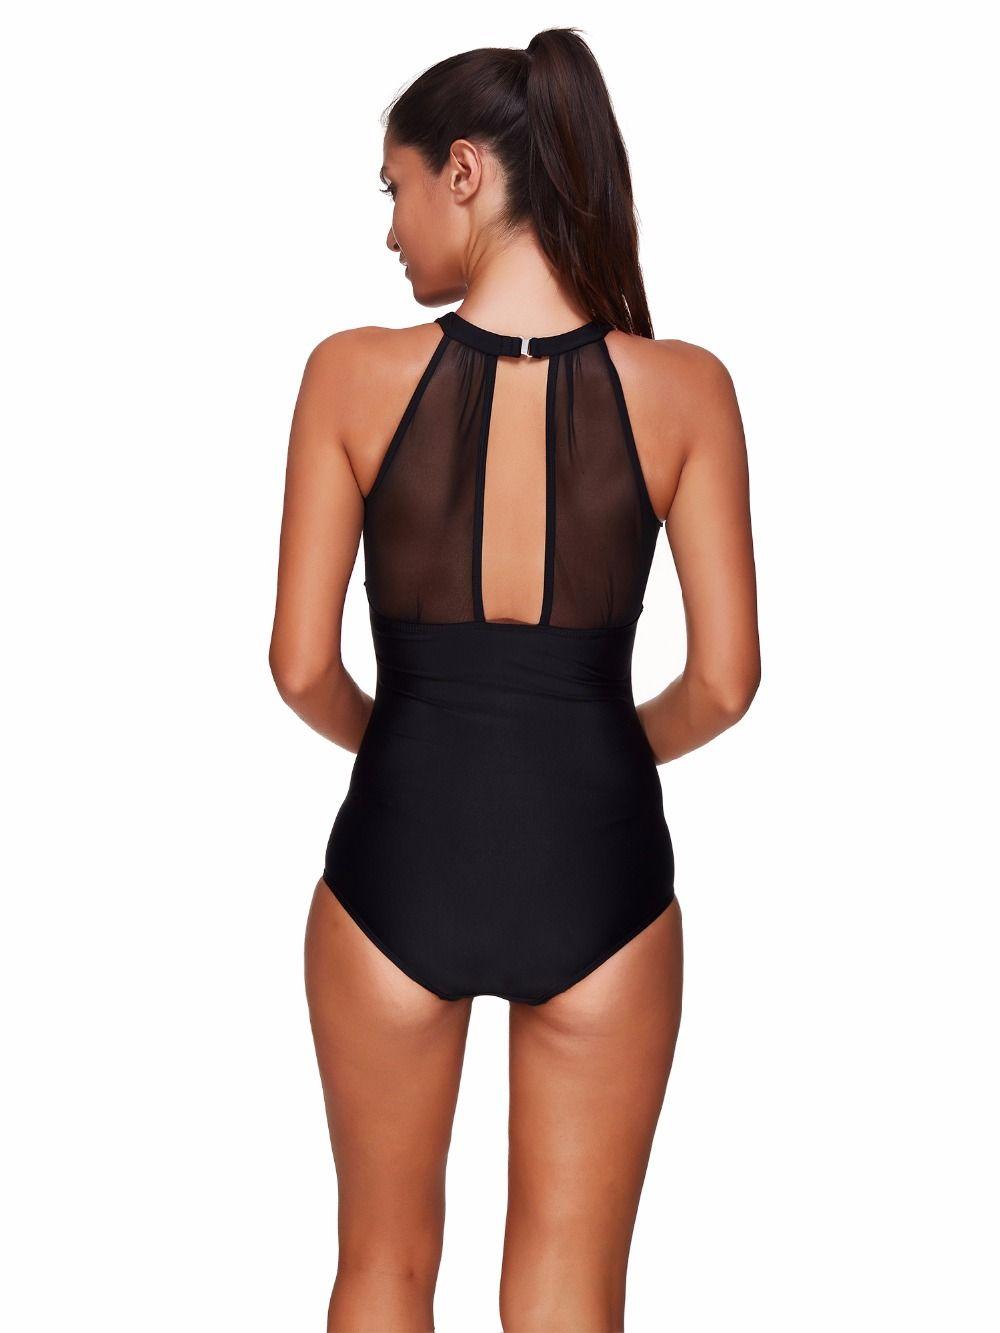 Sexy One Piece Swim Suits 2019 Swimwear Women Mesh Deep V Neck Solid Black High Neck Monokini Swimsuits Push up Bathing Suits